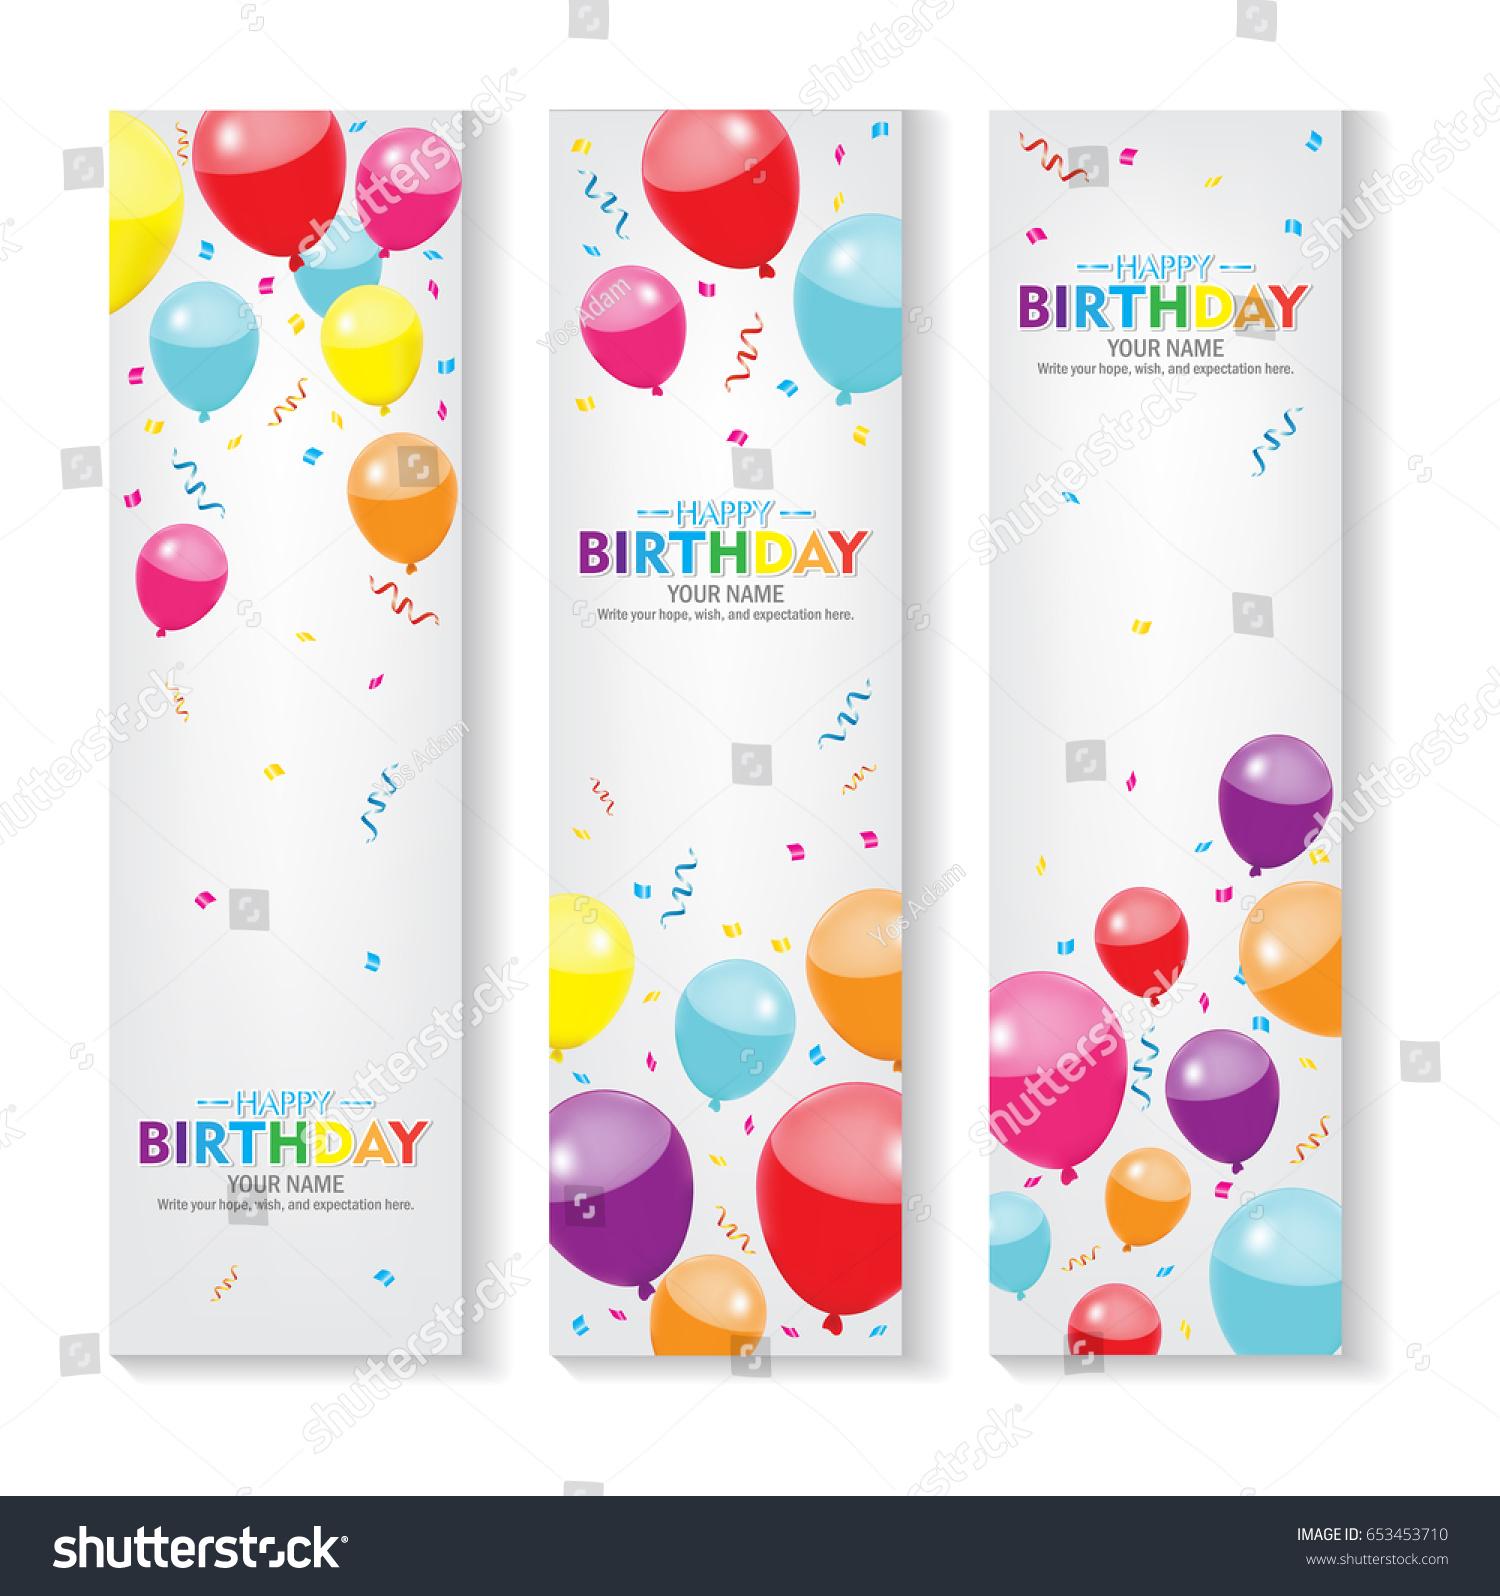 Editable Vertical Happy Birthday Banner Balloon เวกเตอร์สต็